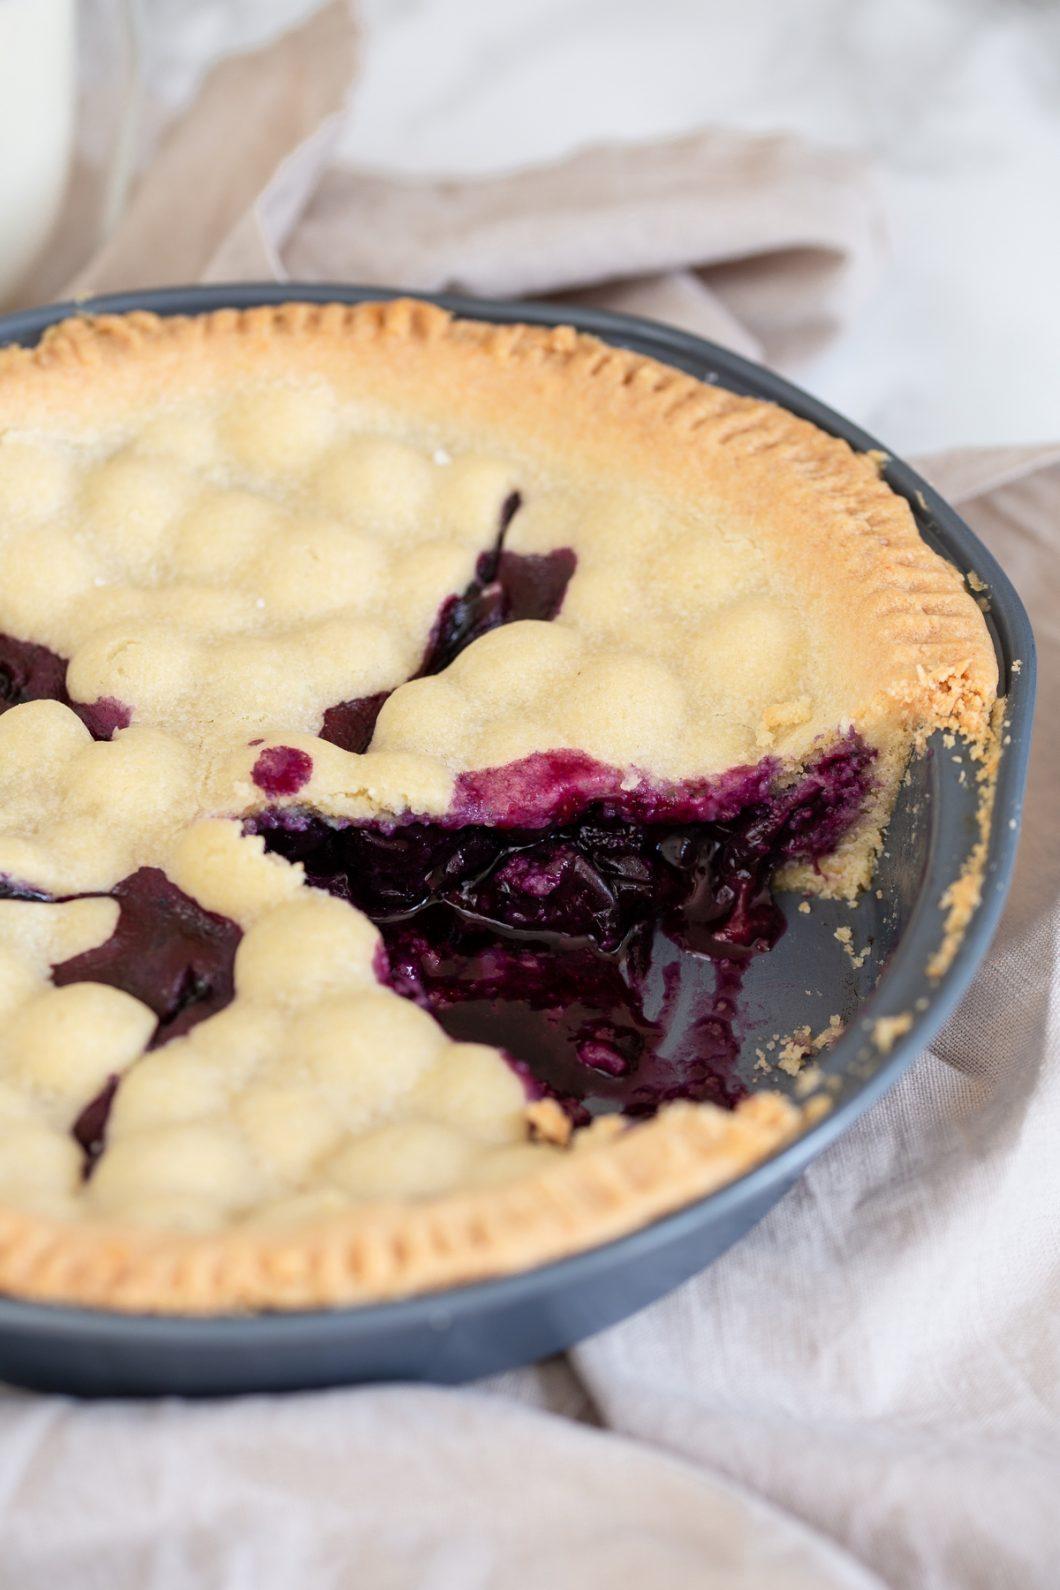 Swedish blueberry pie sliced.